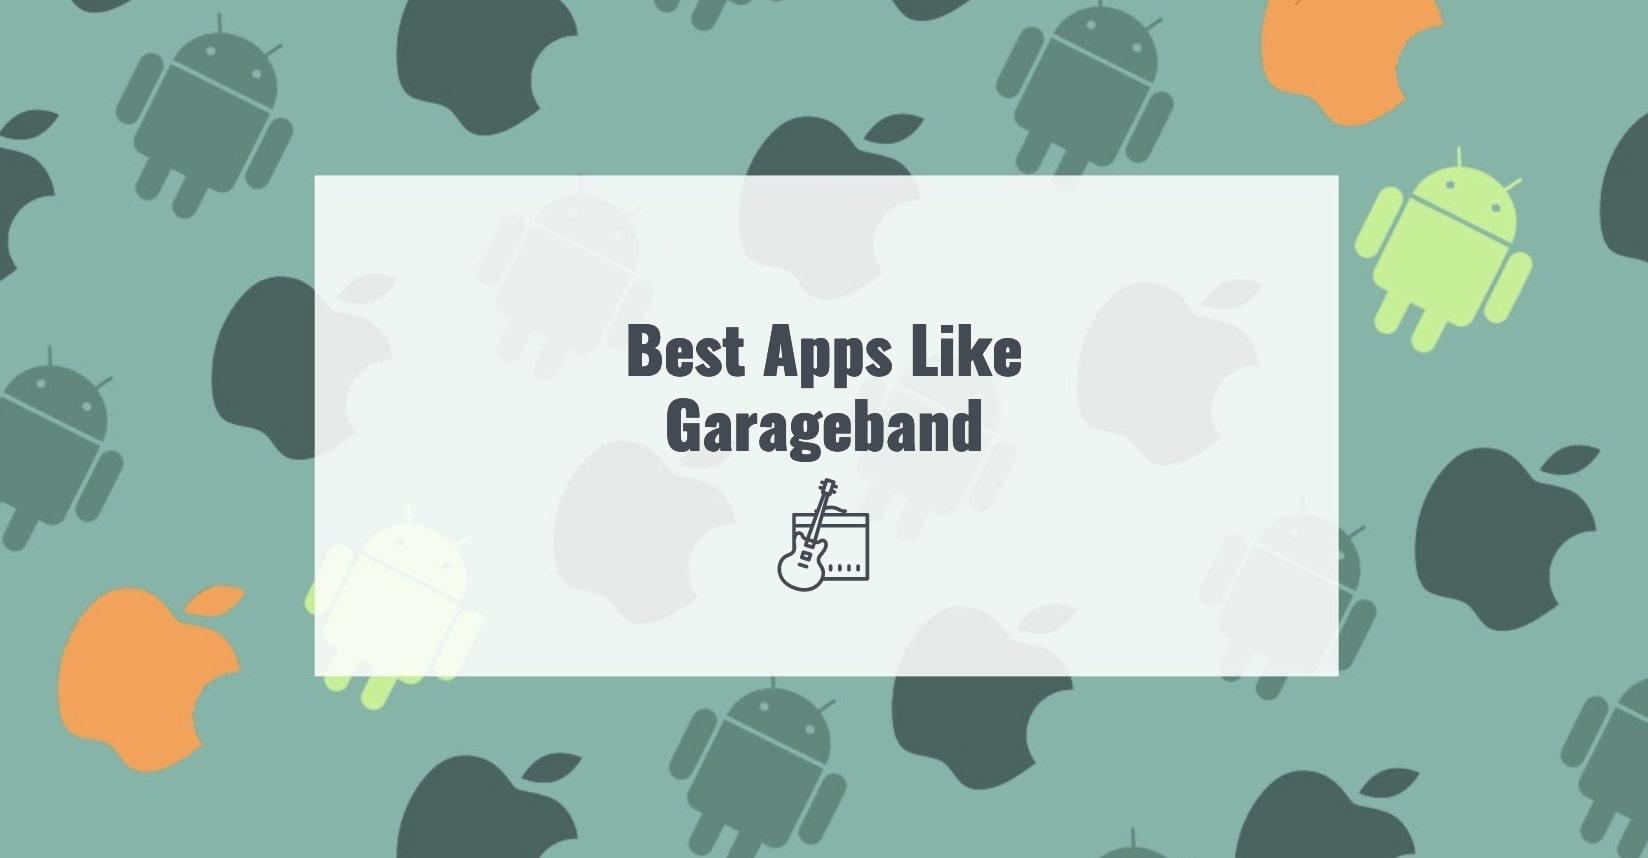 Best Apps Like Garageband